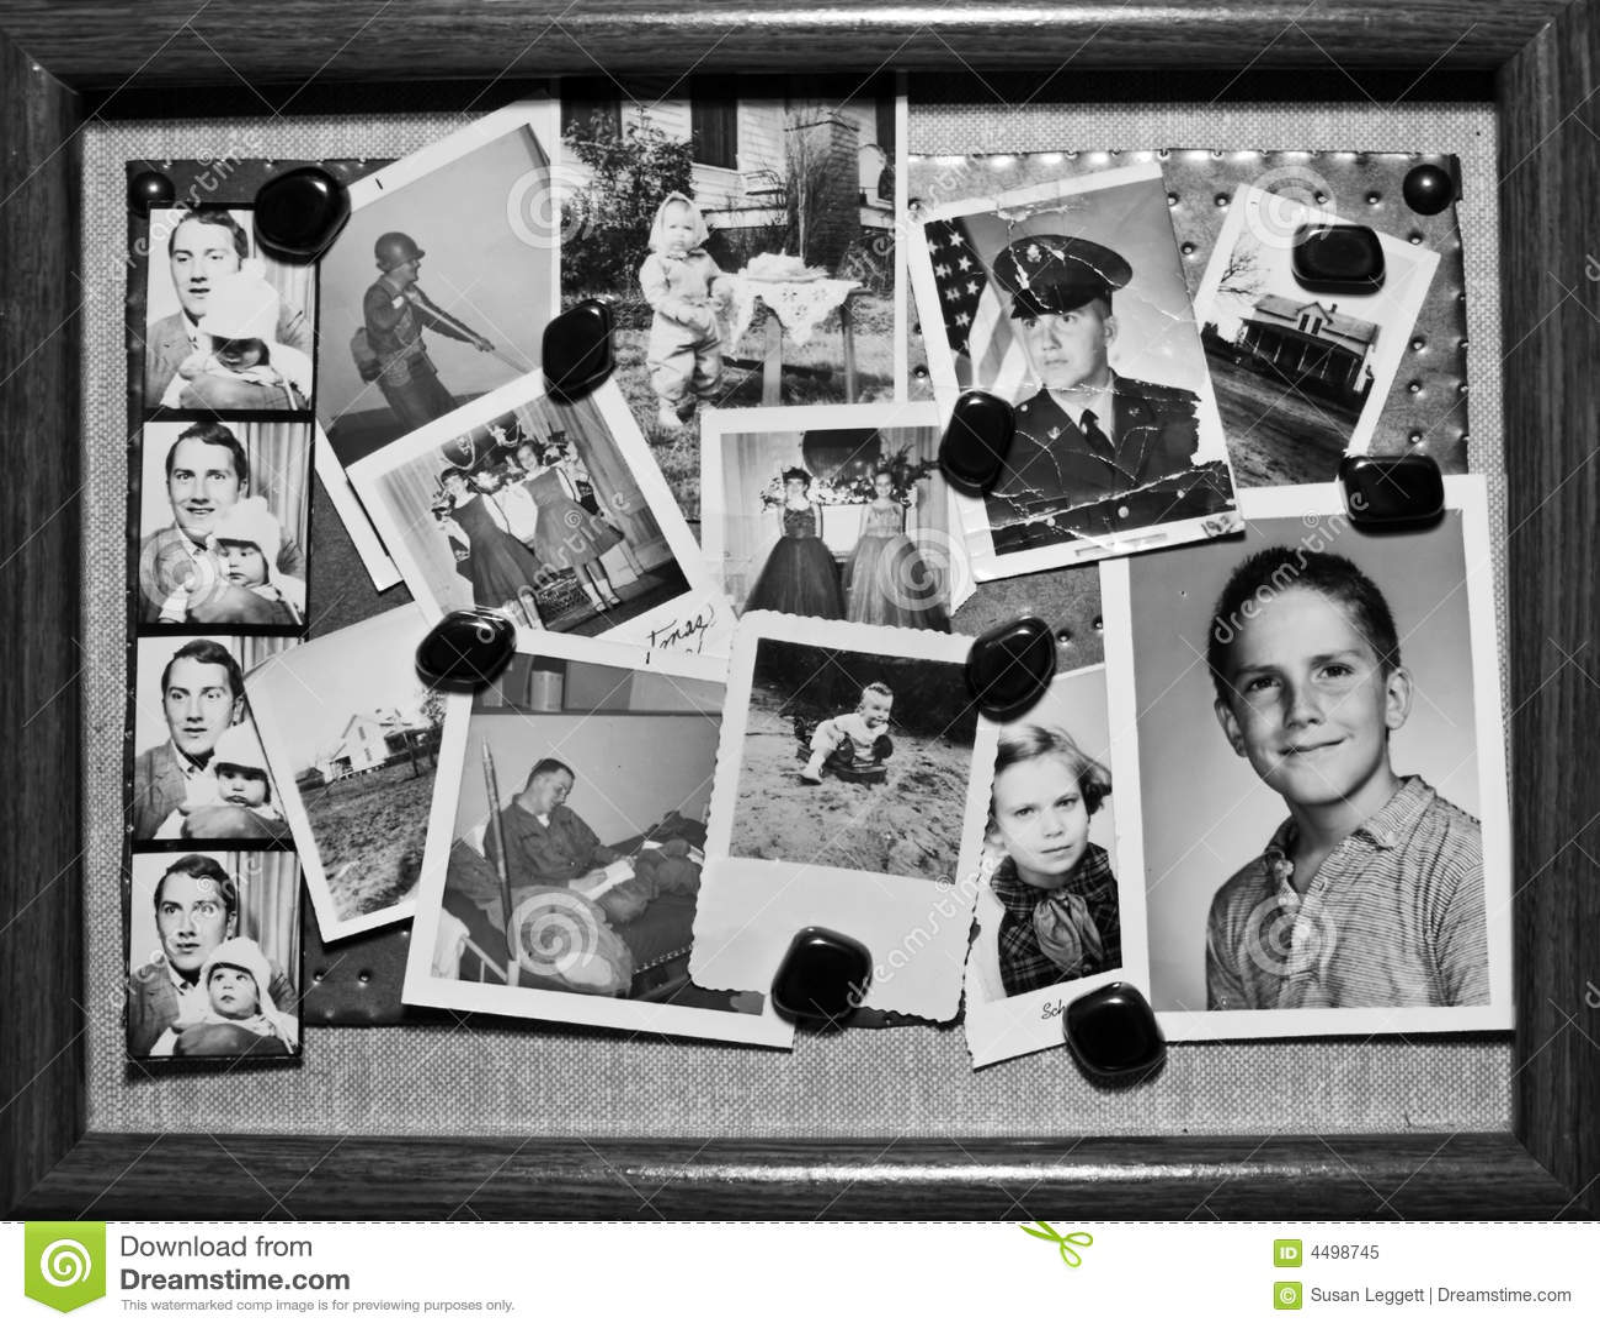 Retro/vintage photos